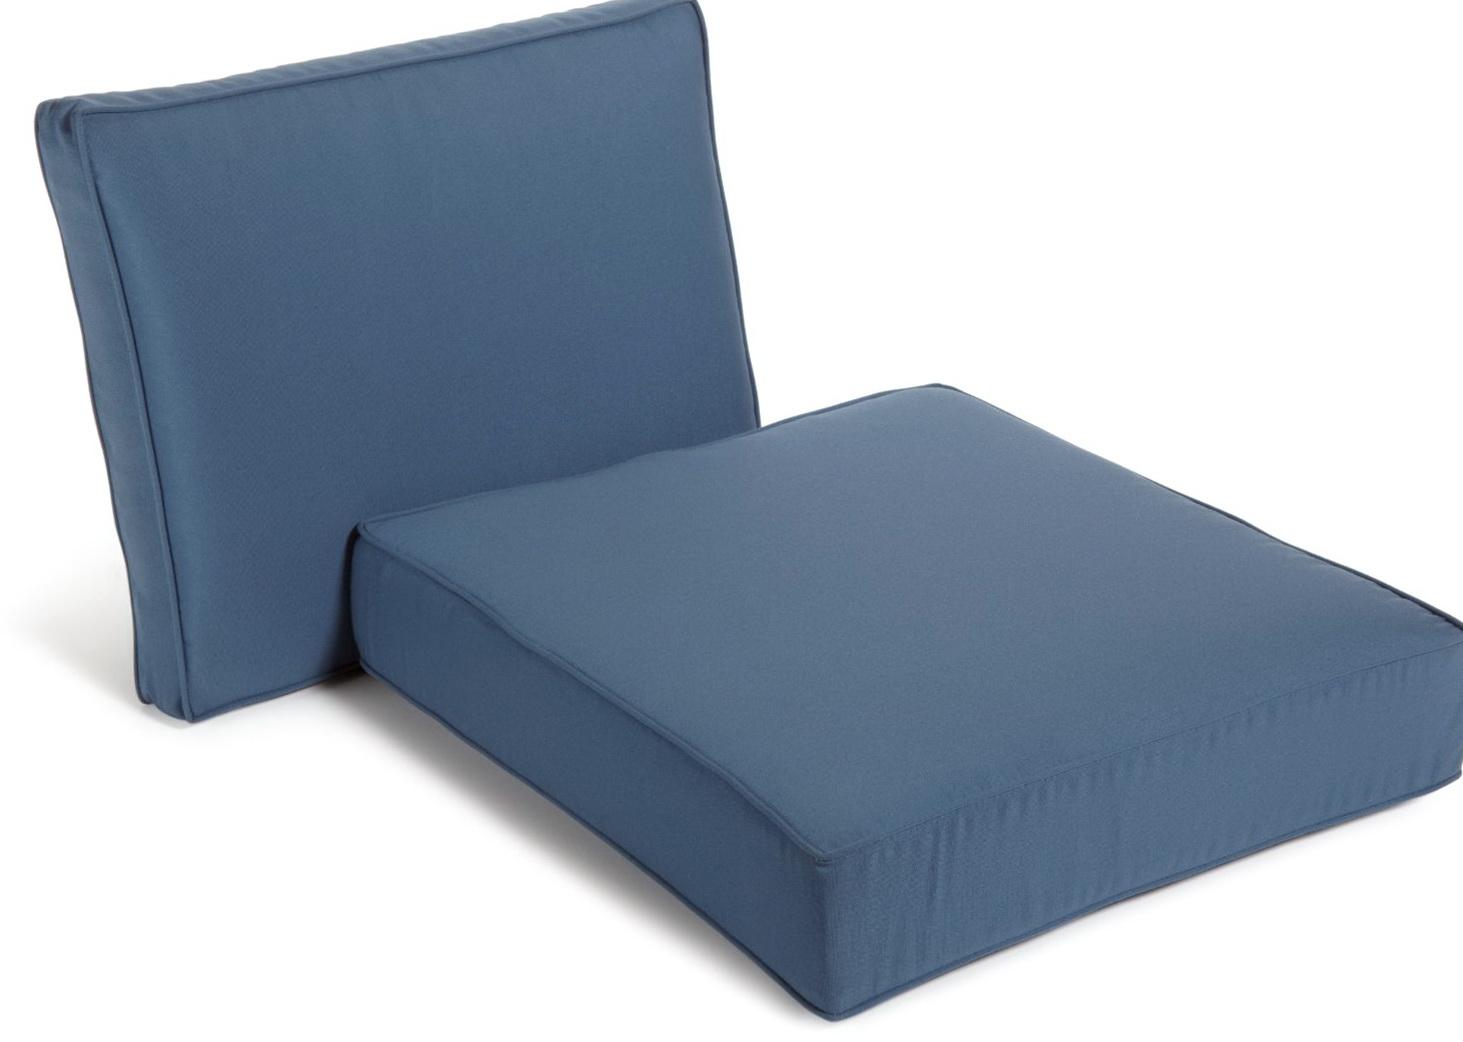 clearance outdoor chair cushions design online shop deep seat patio home ideas